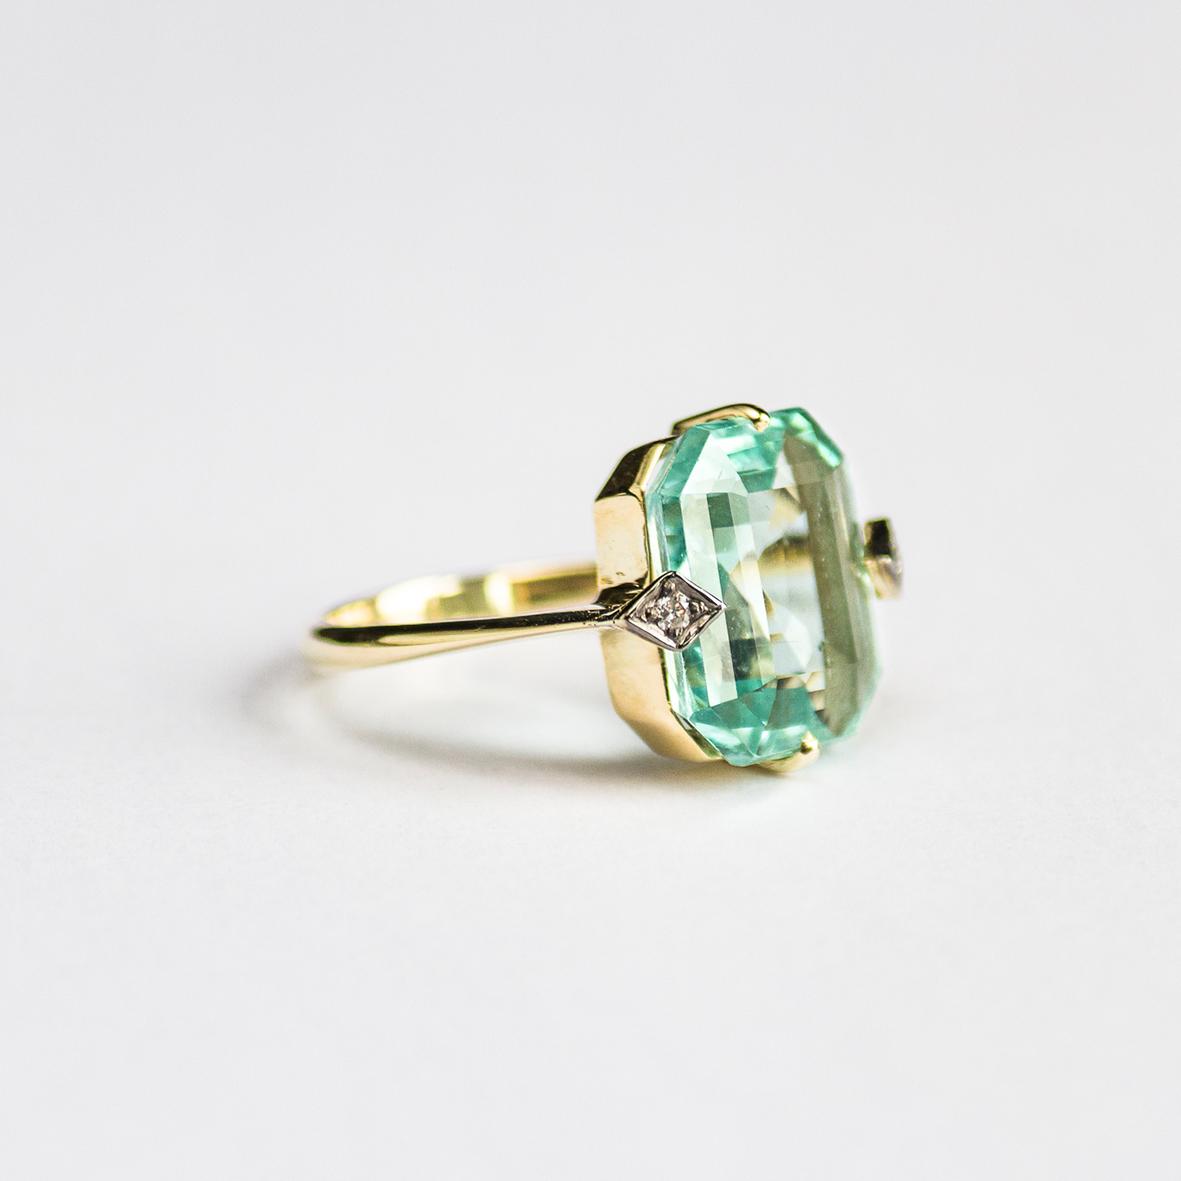 1. OONA_gems of ceylon_ficha3_green aquamarine ring